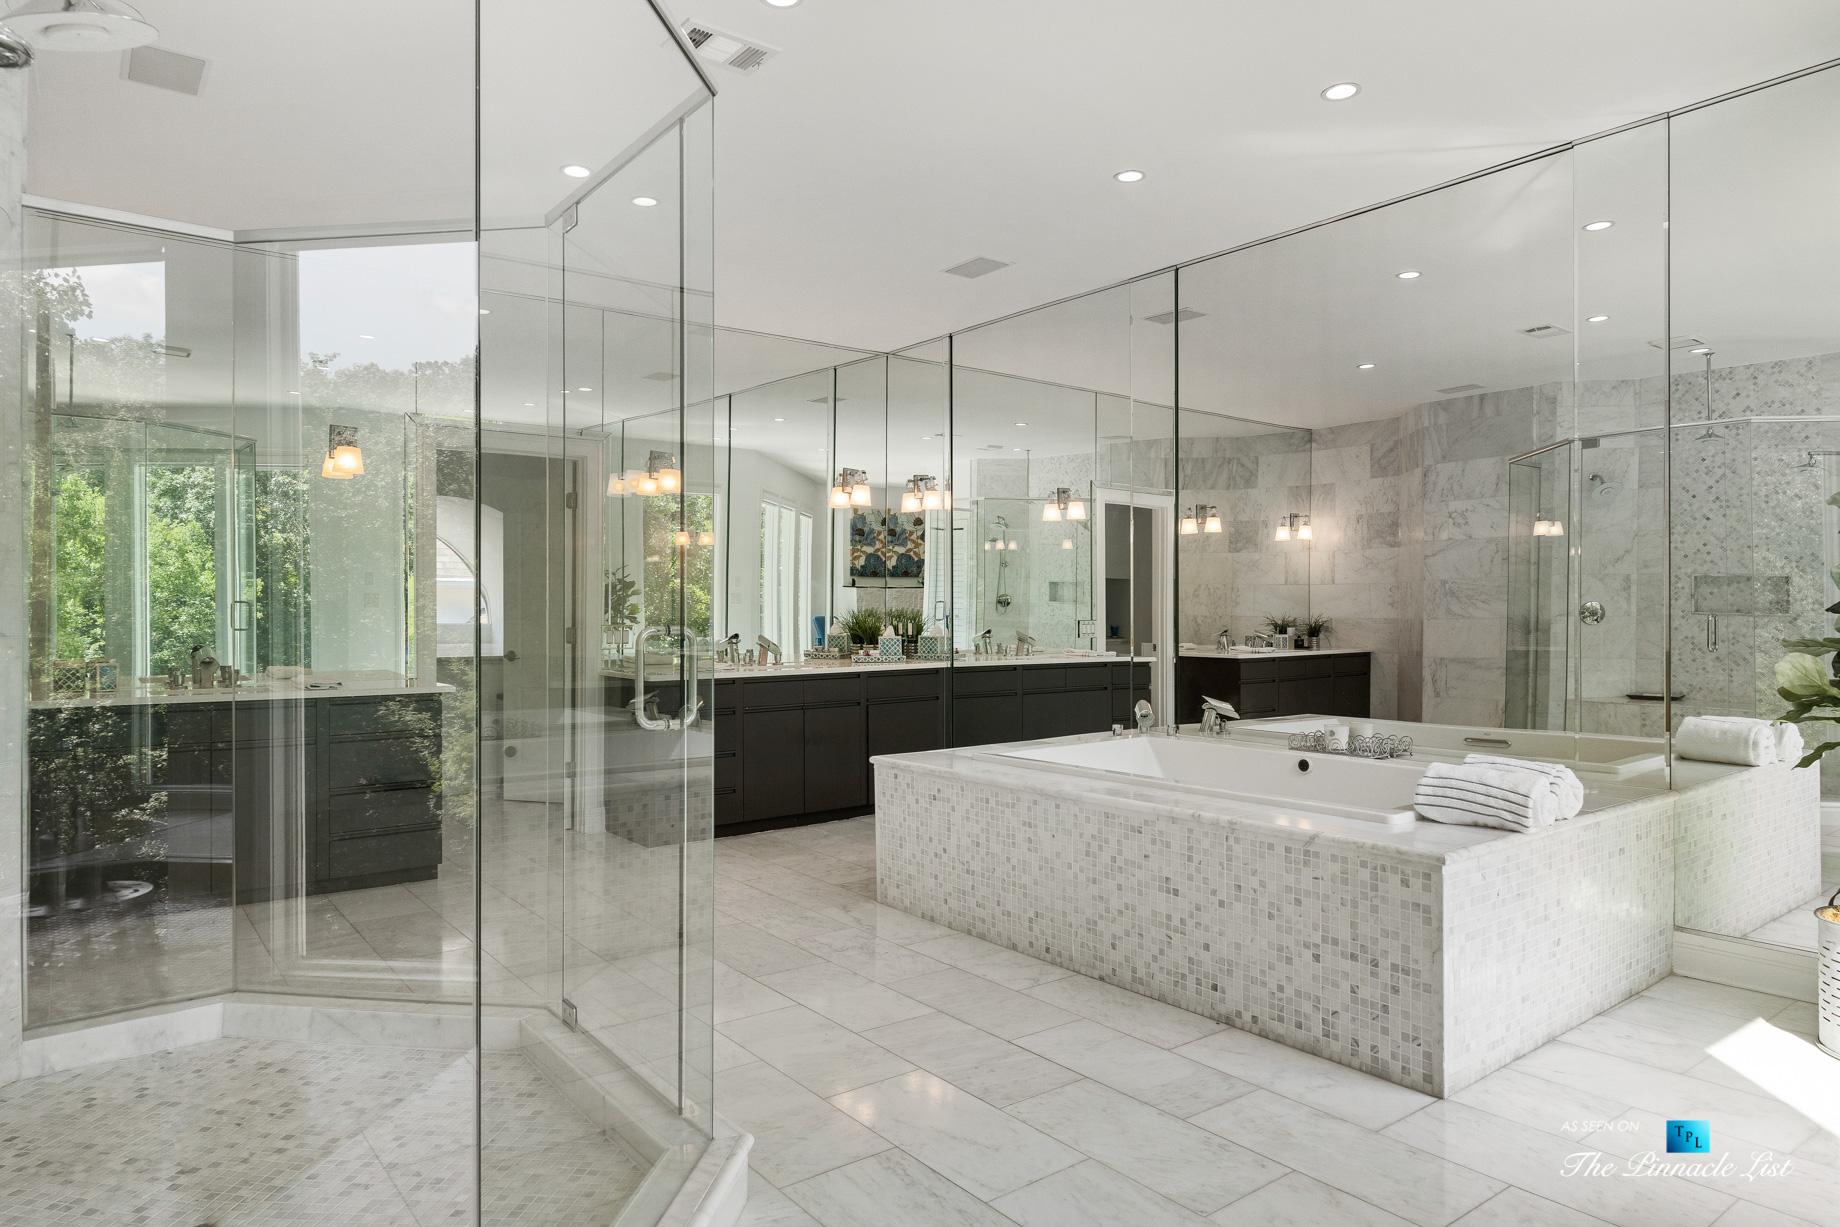 3906 Paces Ferry Rd NW, Atlanta, GA, USA – Master Bathroom Glass Wall Shower – Luxury Real Estate – Buckhead Home